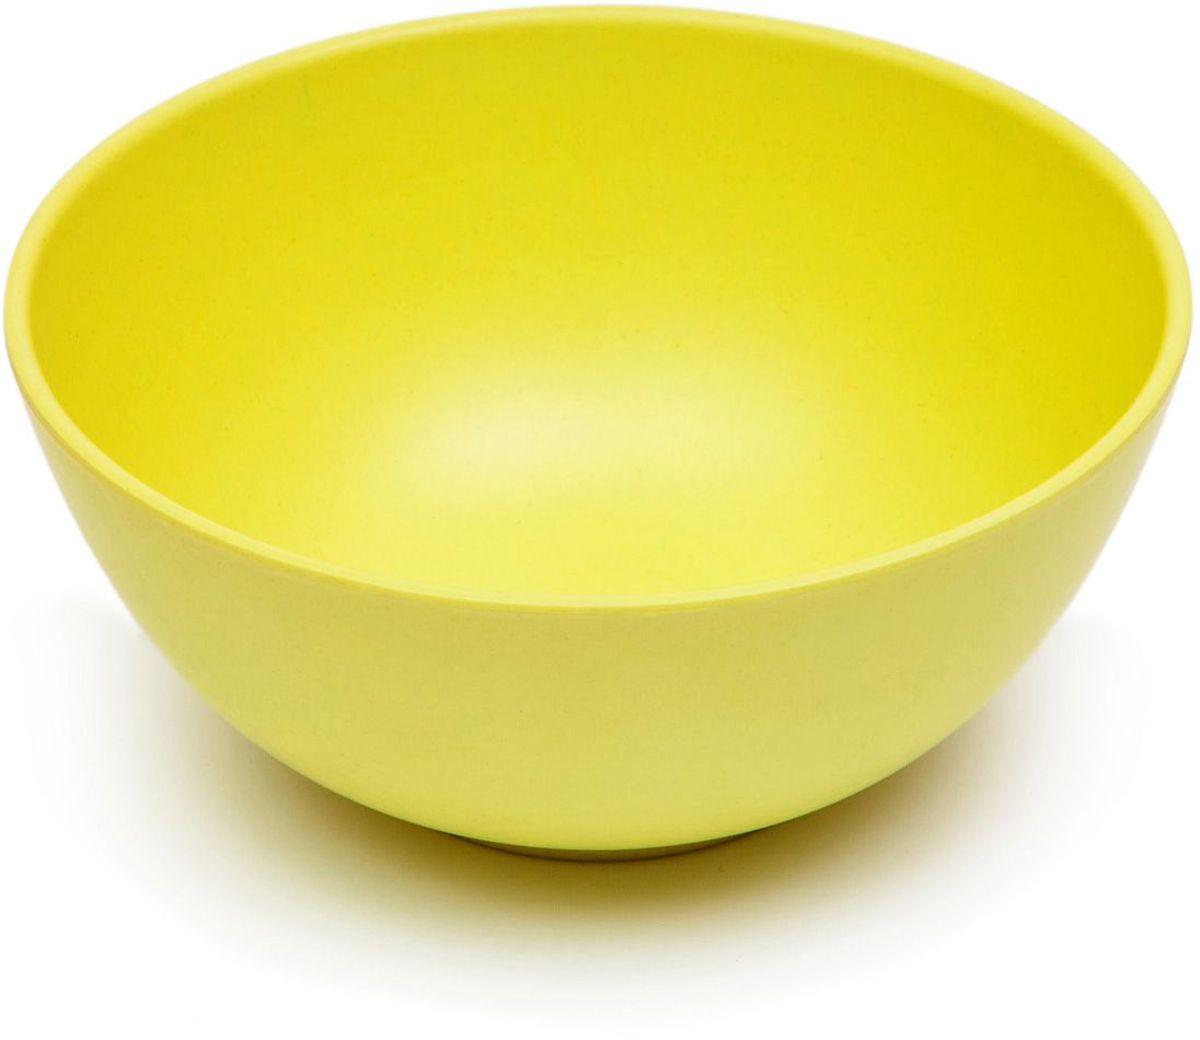 "Миска ""MoulinVilla"", цвет: зеленый, диаметр 16 см"